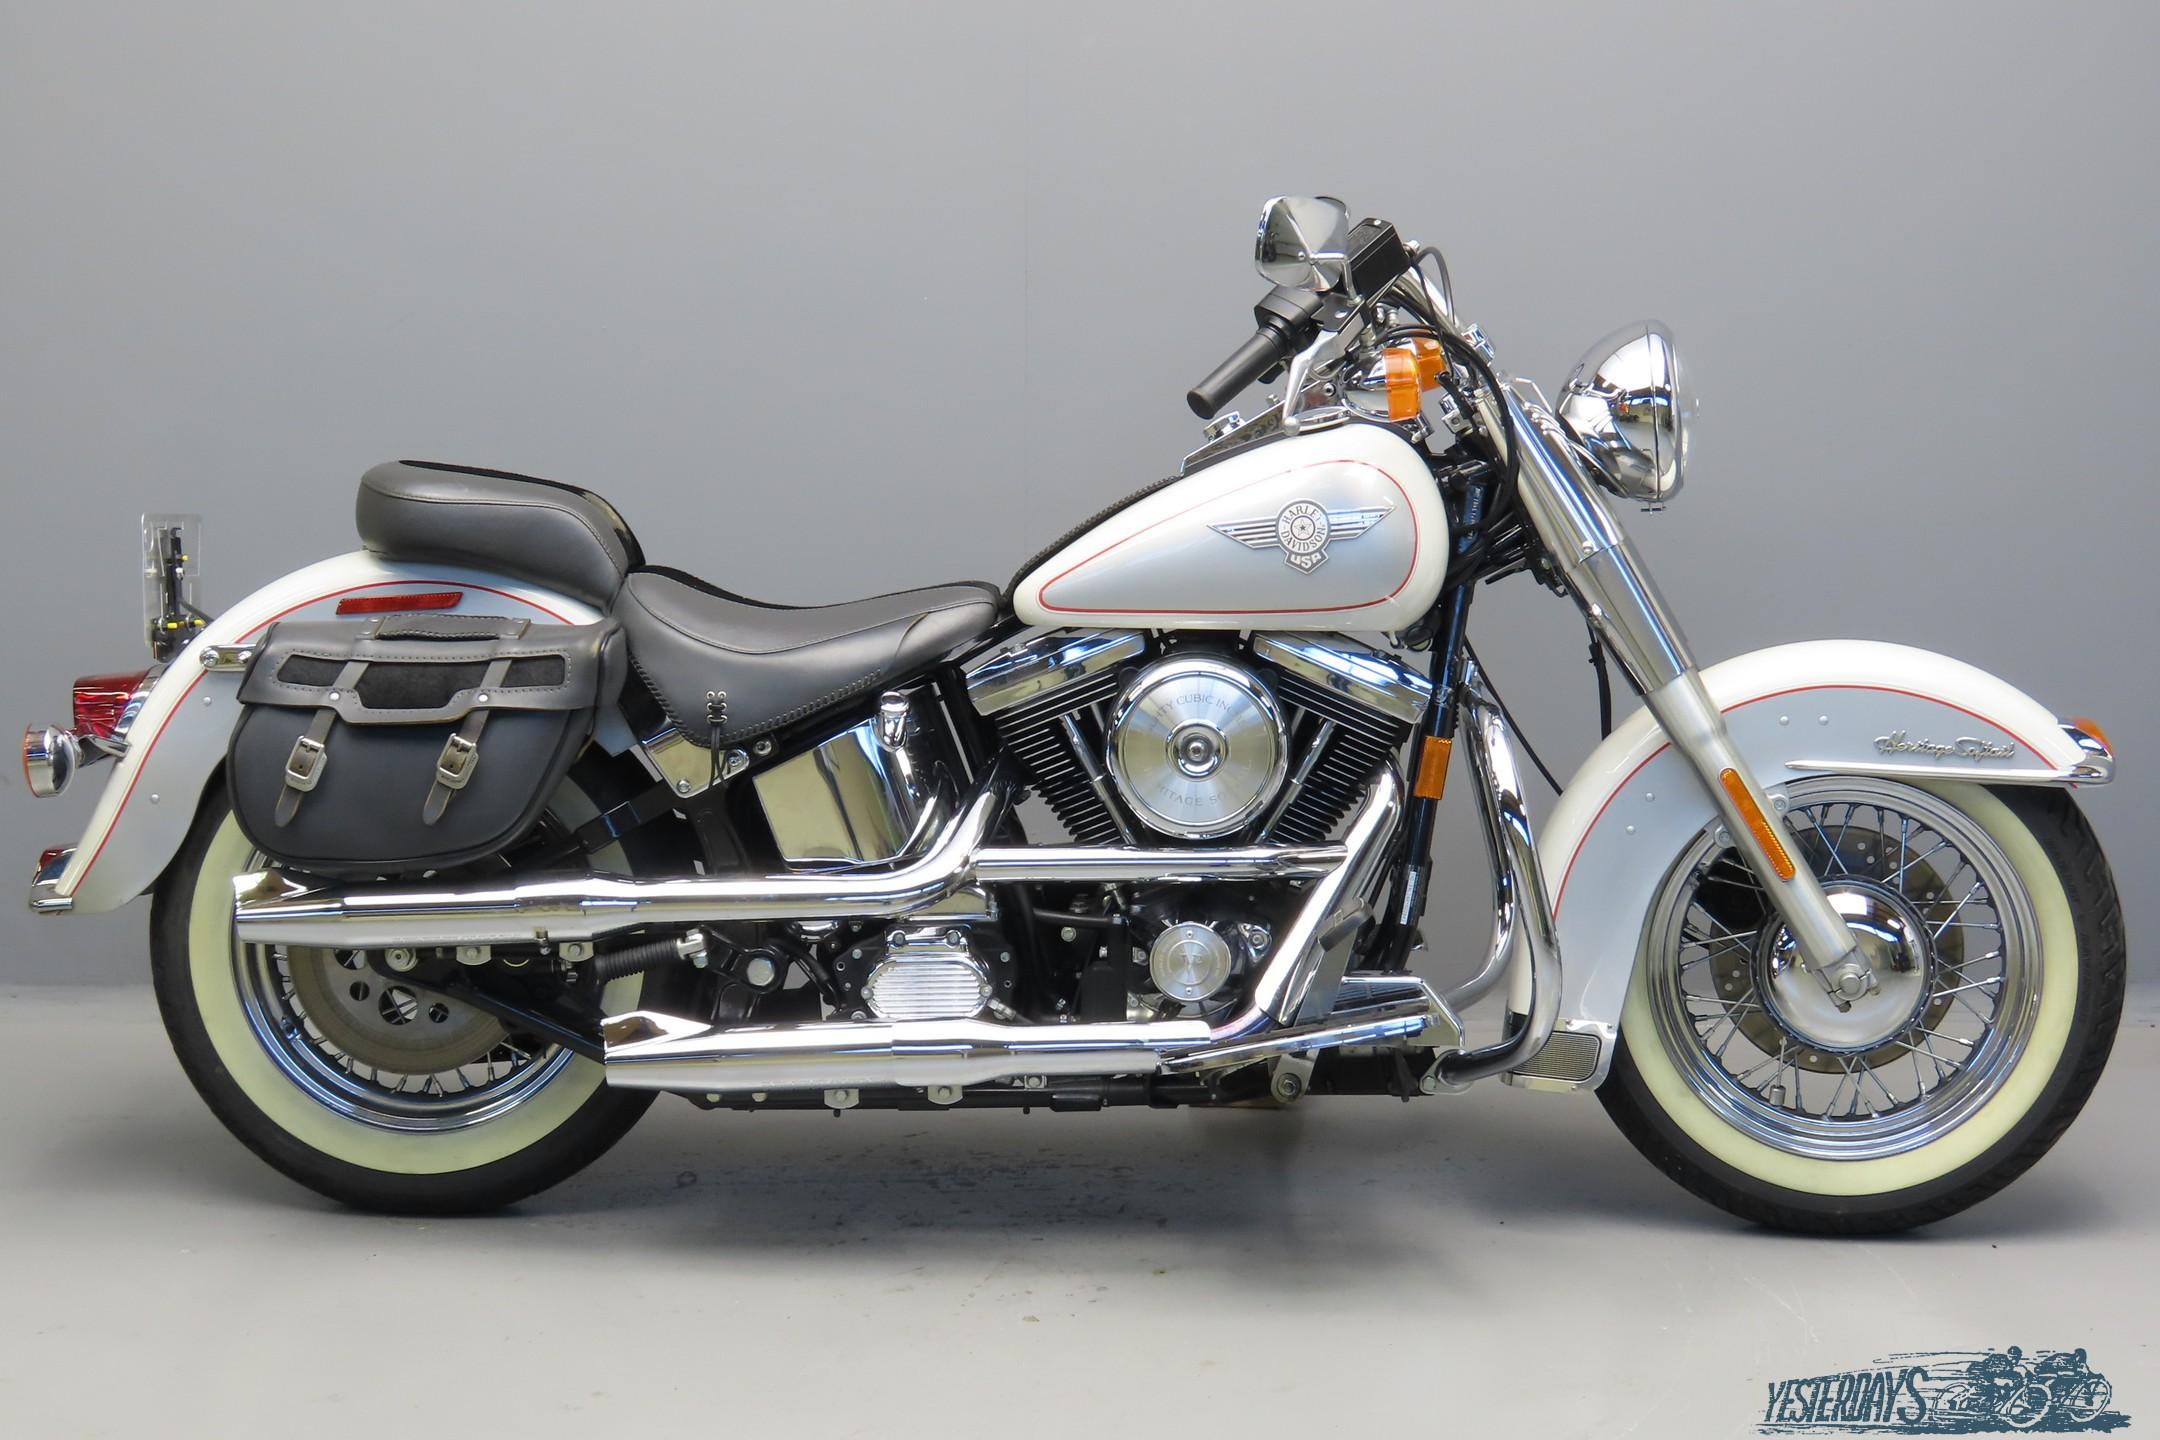 Harley Davidson 1994 Heritage Nostalgia 3010